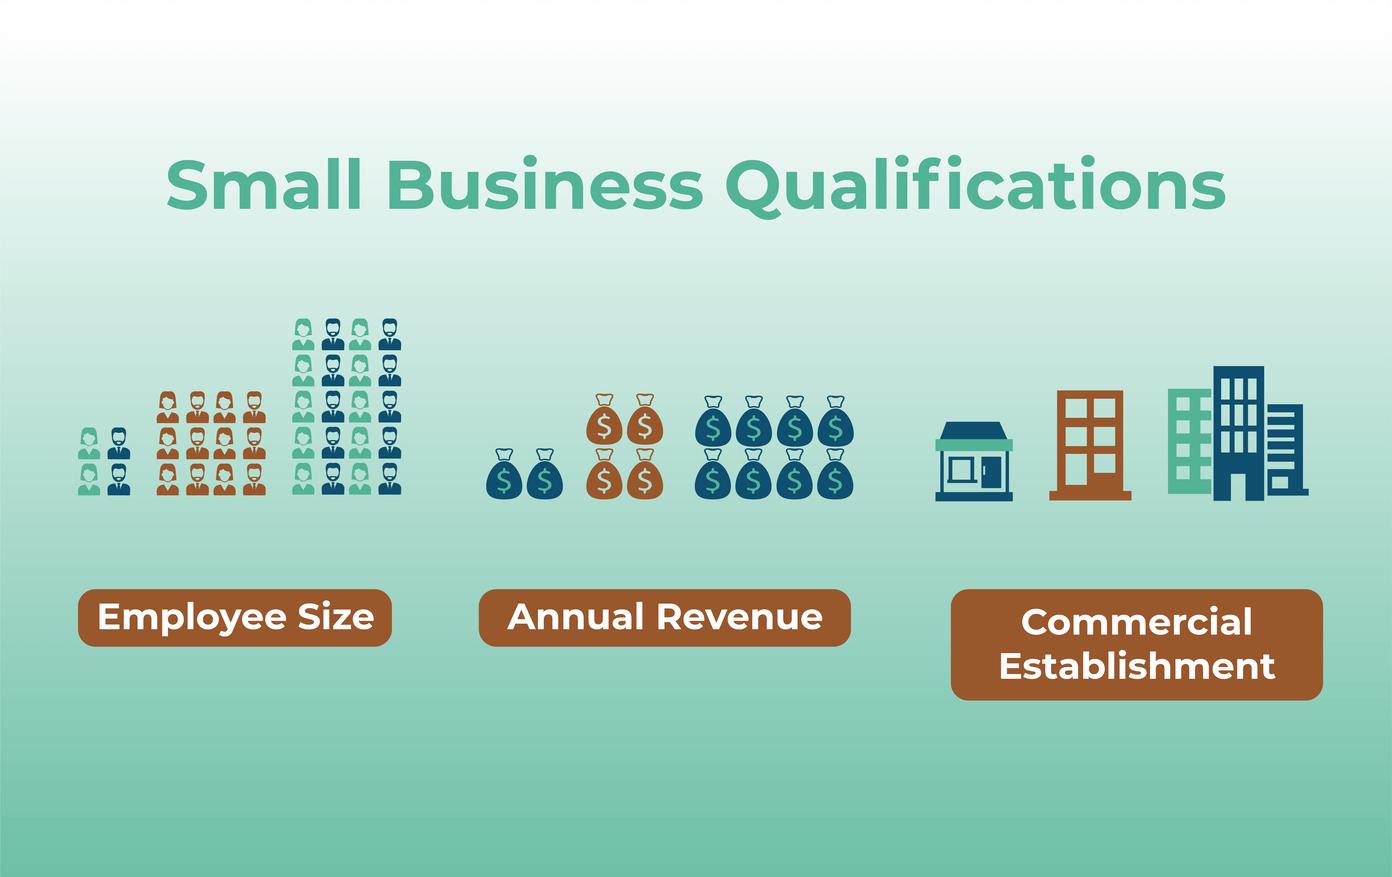 Medium-Sized Business